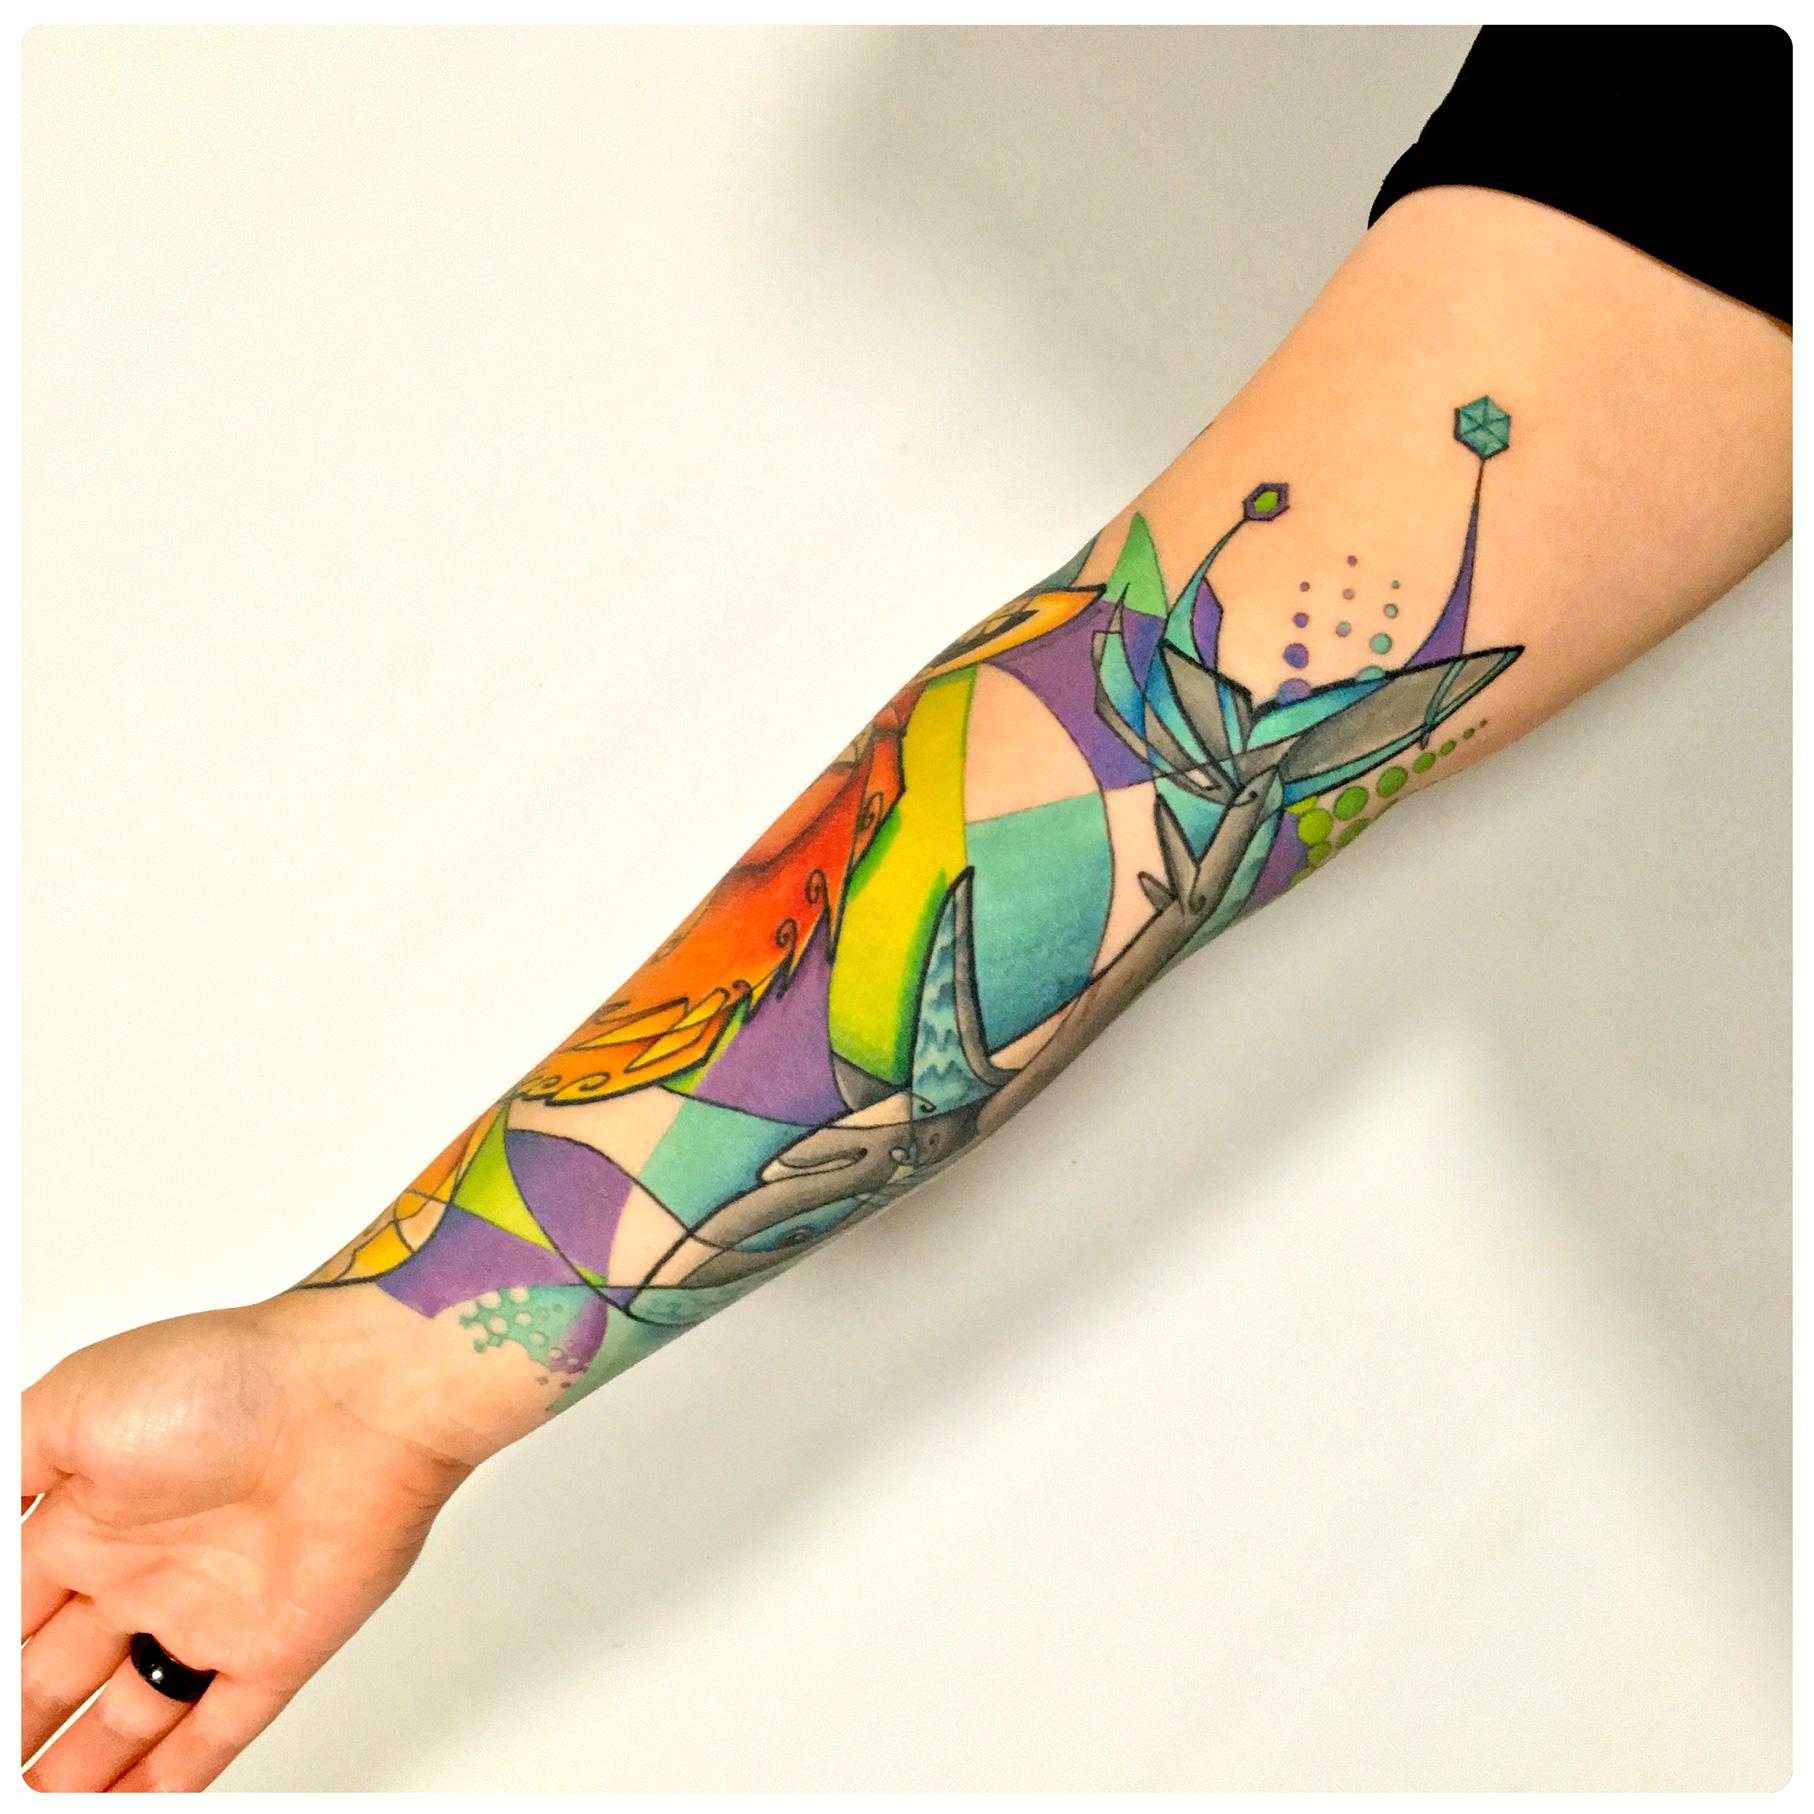 web-2_2016_tattoo_forearm_fox-shark-abstract.jpg